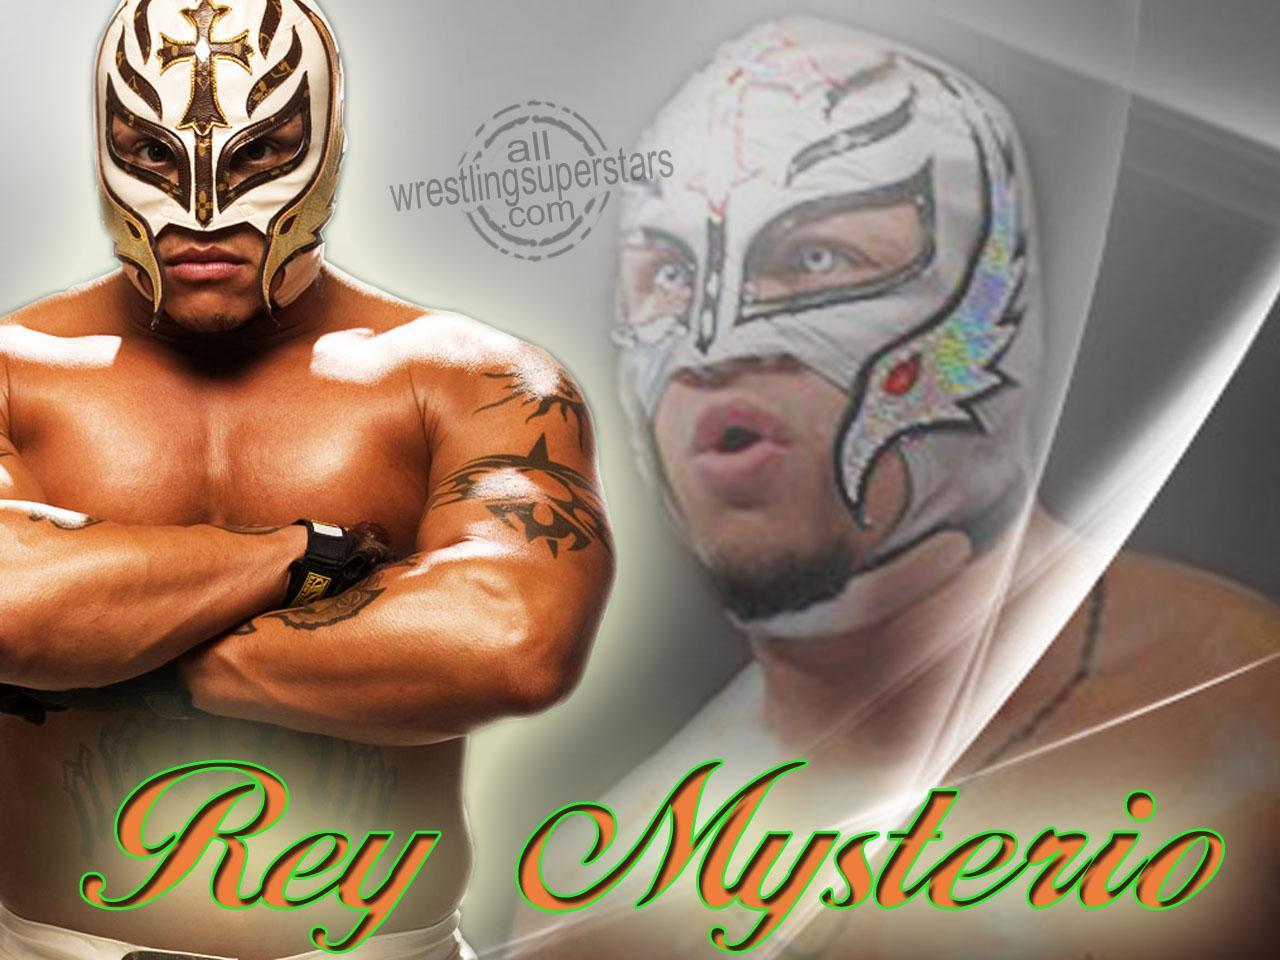 http://4.bp.blogspot.com/-VqPPMZ8PCso/T_vwbQxiv8I/AAAAAAAAV2c/uA-V1hxsj5g/s1600/WWE+Superstar+Rey+Mysterio+wallpapers+2012.jpg